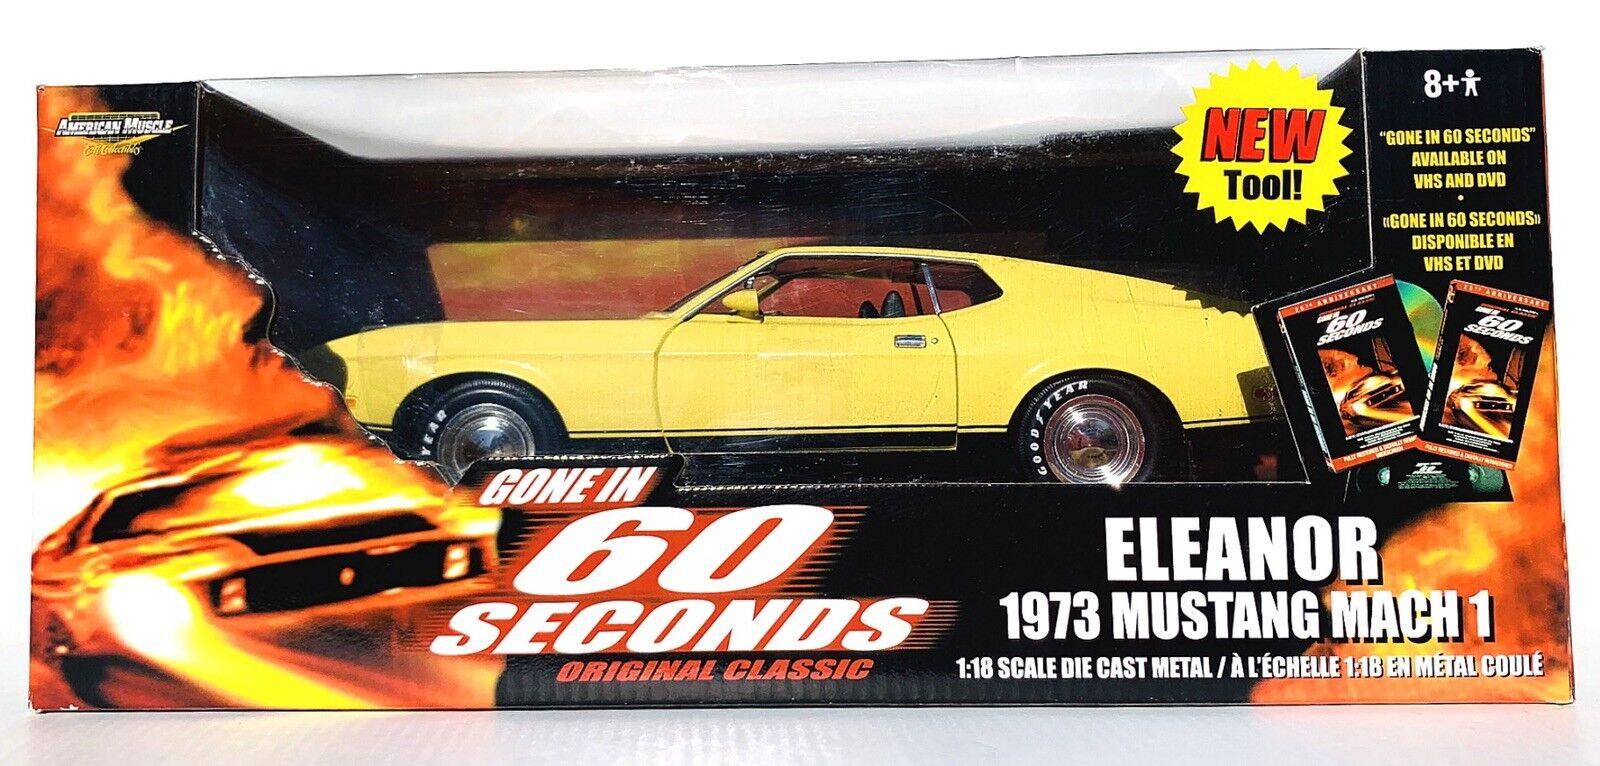 ERTL AMERICAN MUSCLE ELEANOR 1973 MUSTANG MACH 1 1 18 SCALE GONE IN 60 SECONDS